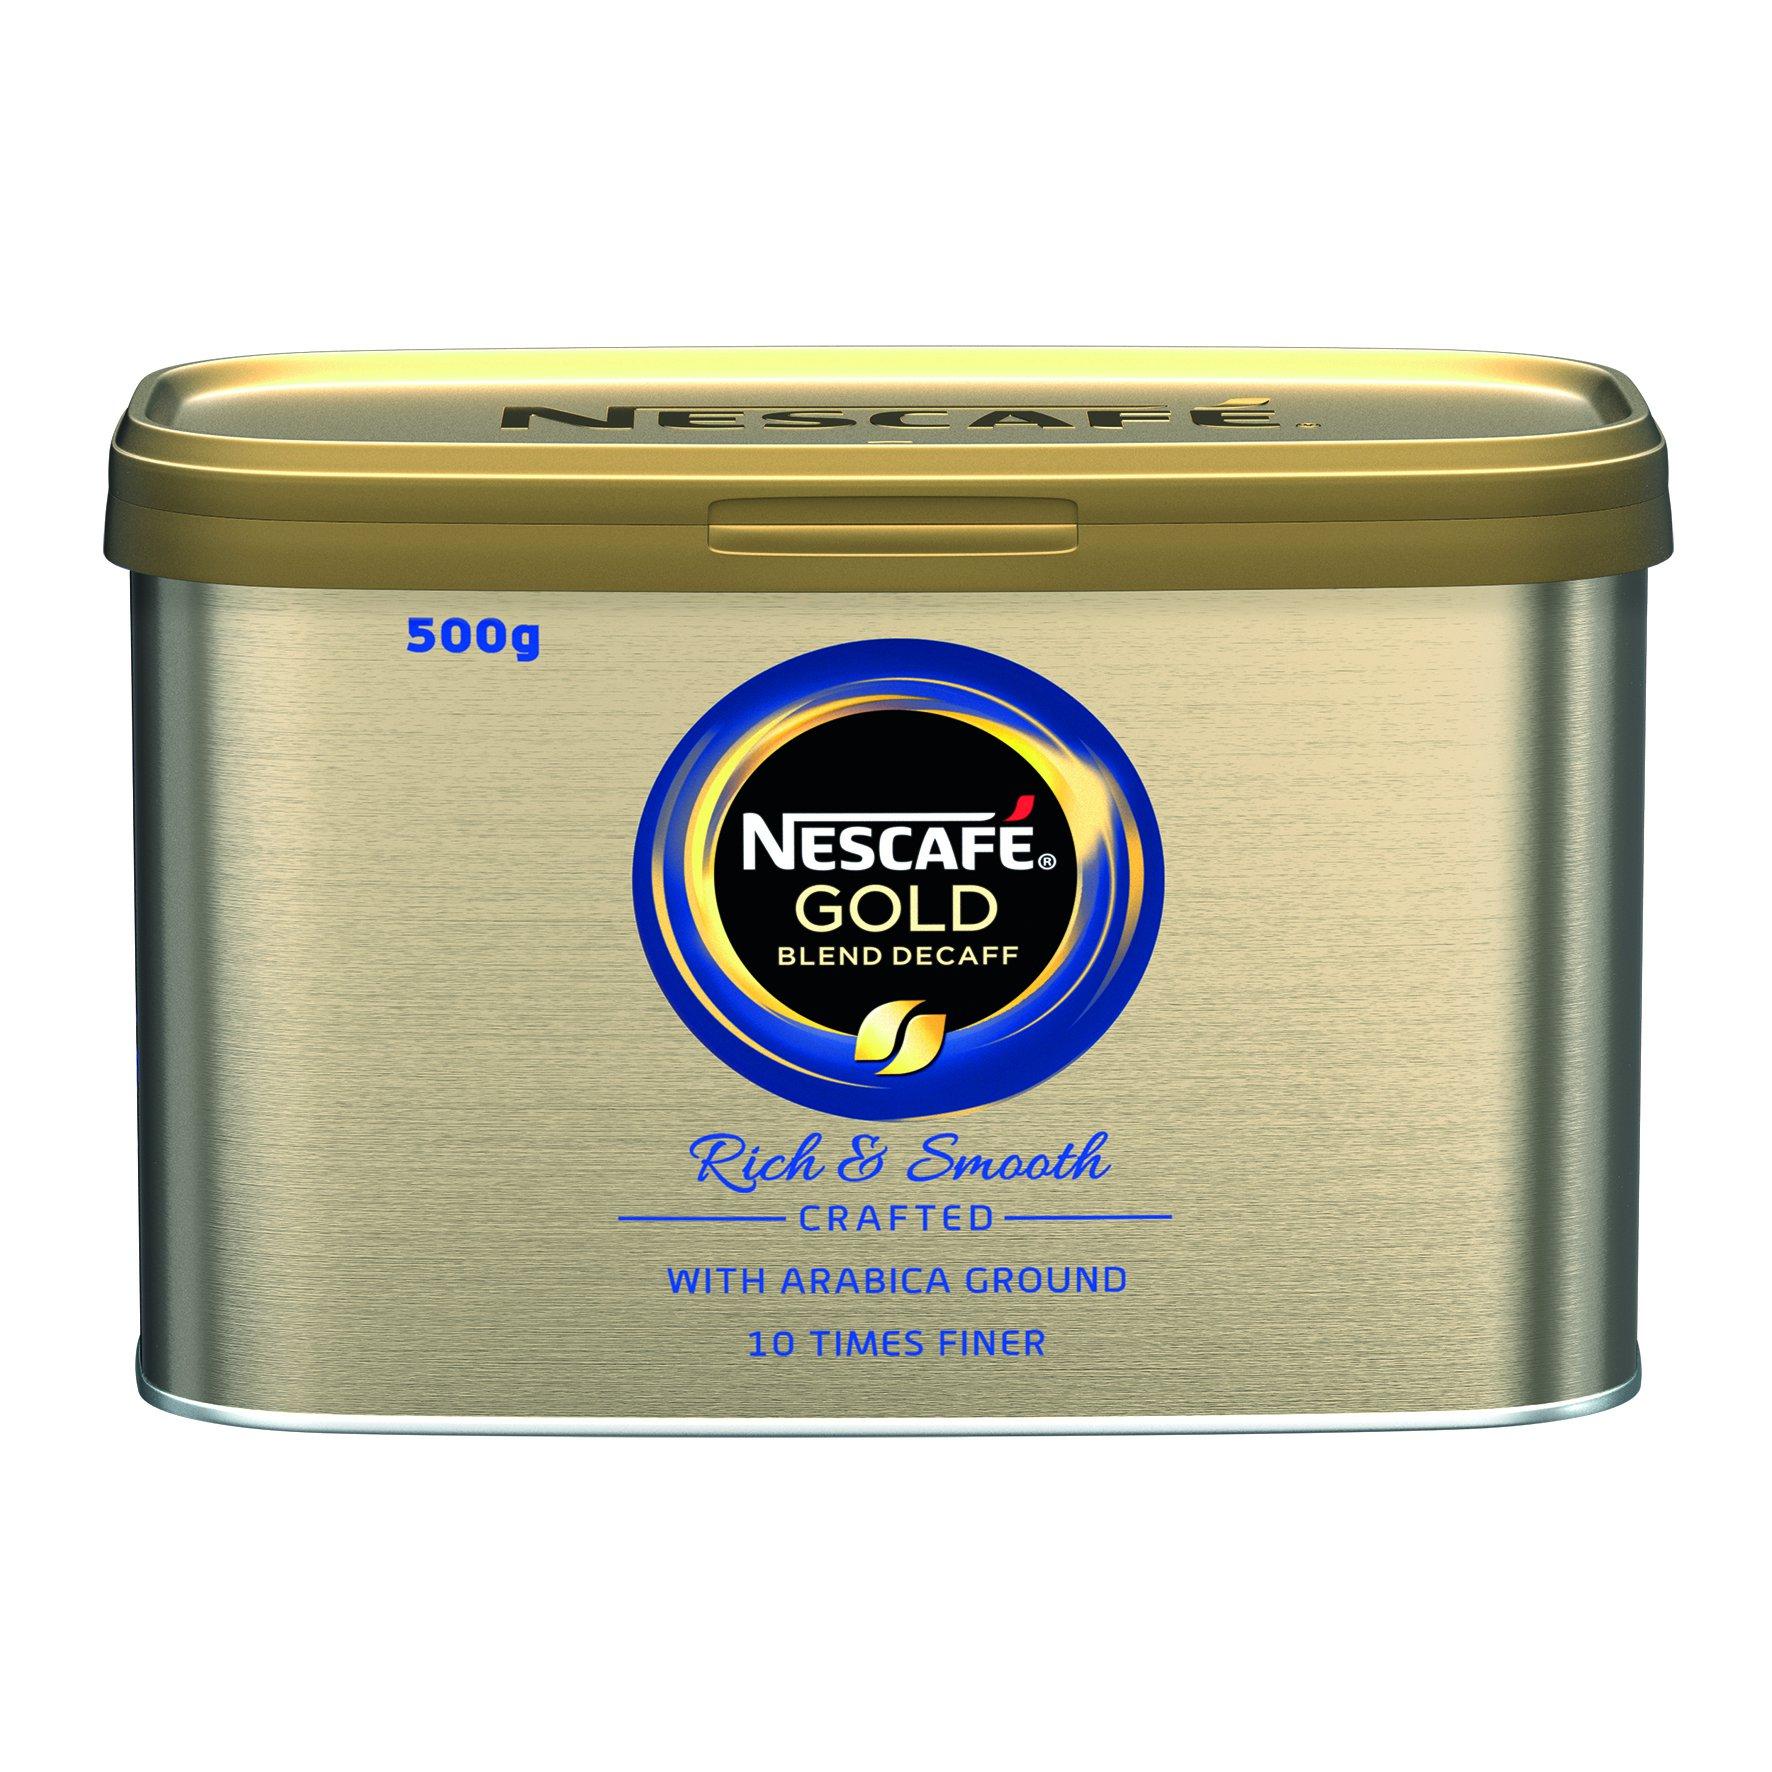 NESCAFE GOLD BLEND Decaffeinated Coffee Granules 500g